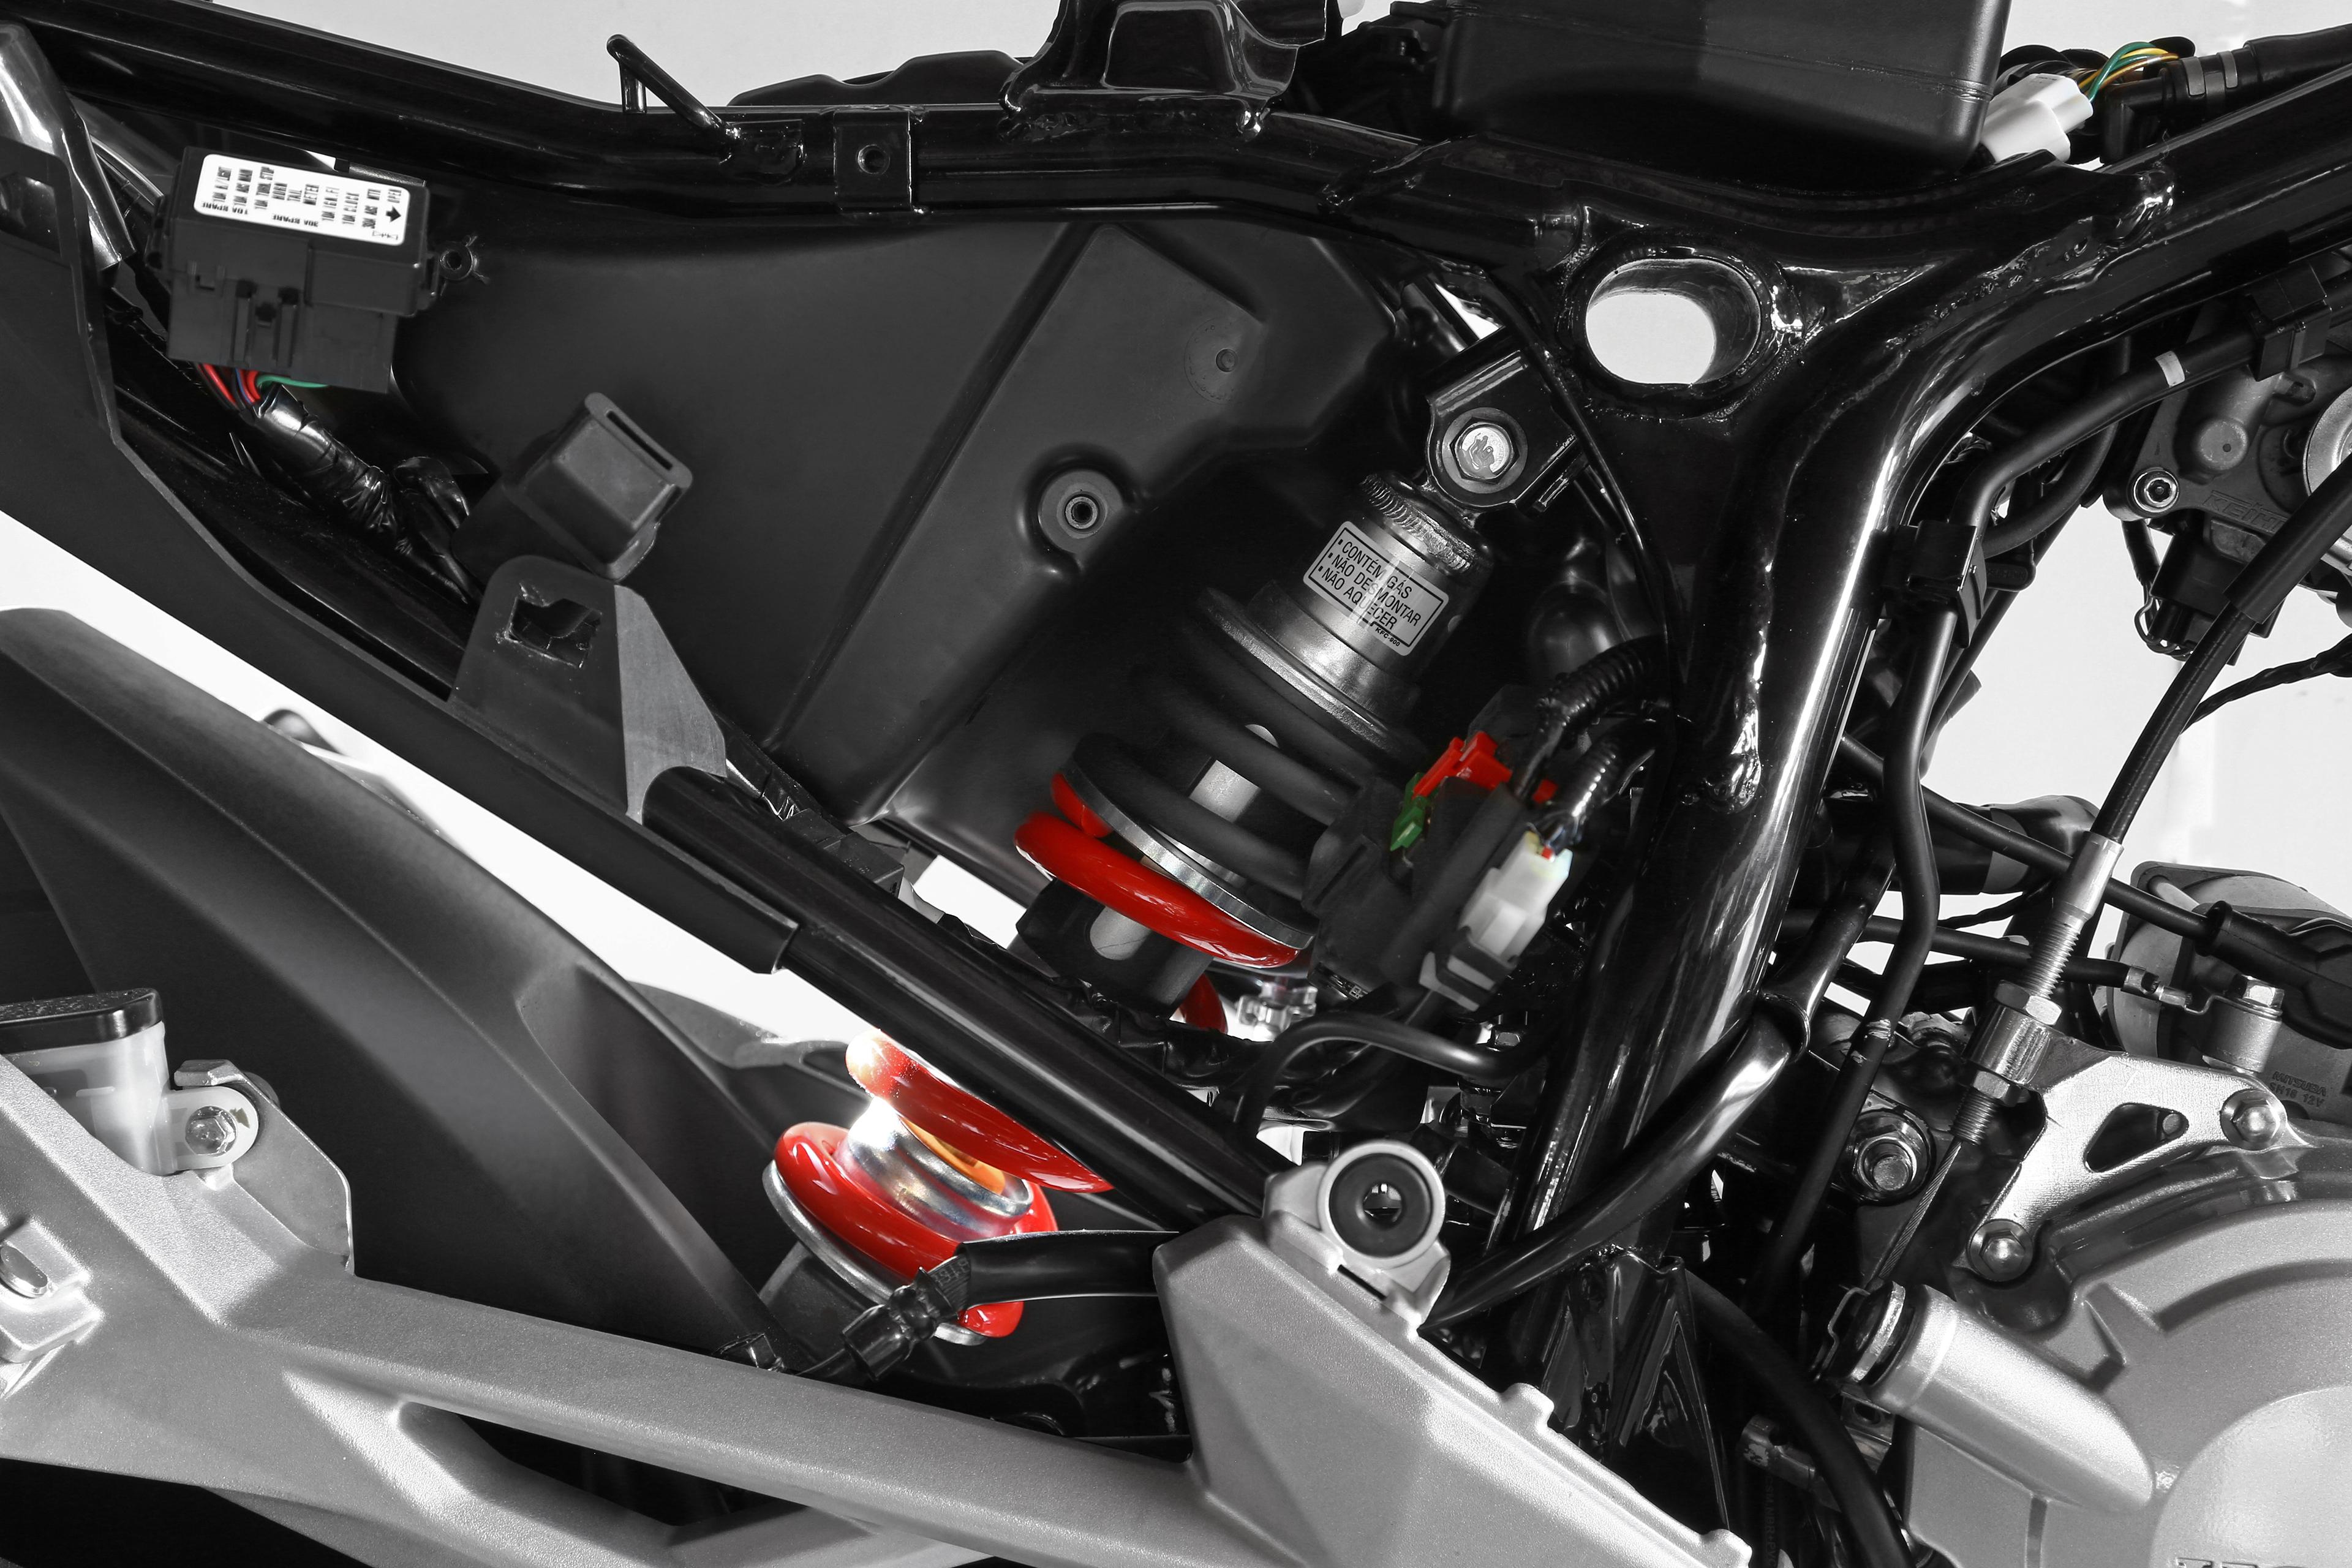 Ficha técnica da Honda CB 250F Twister 2016 a 2020